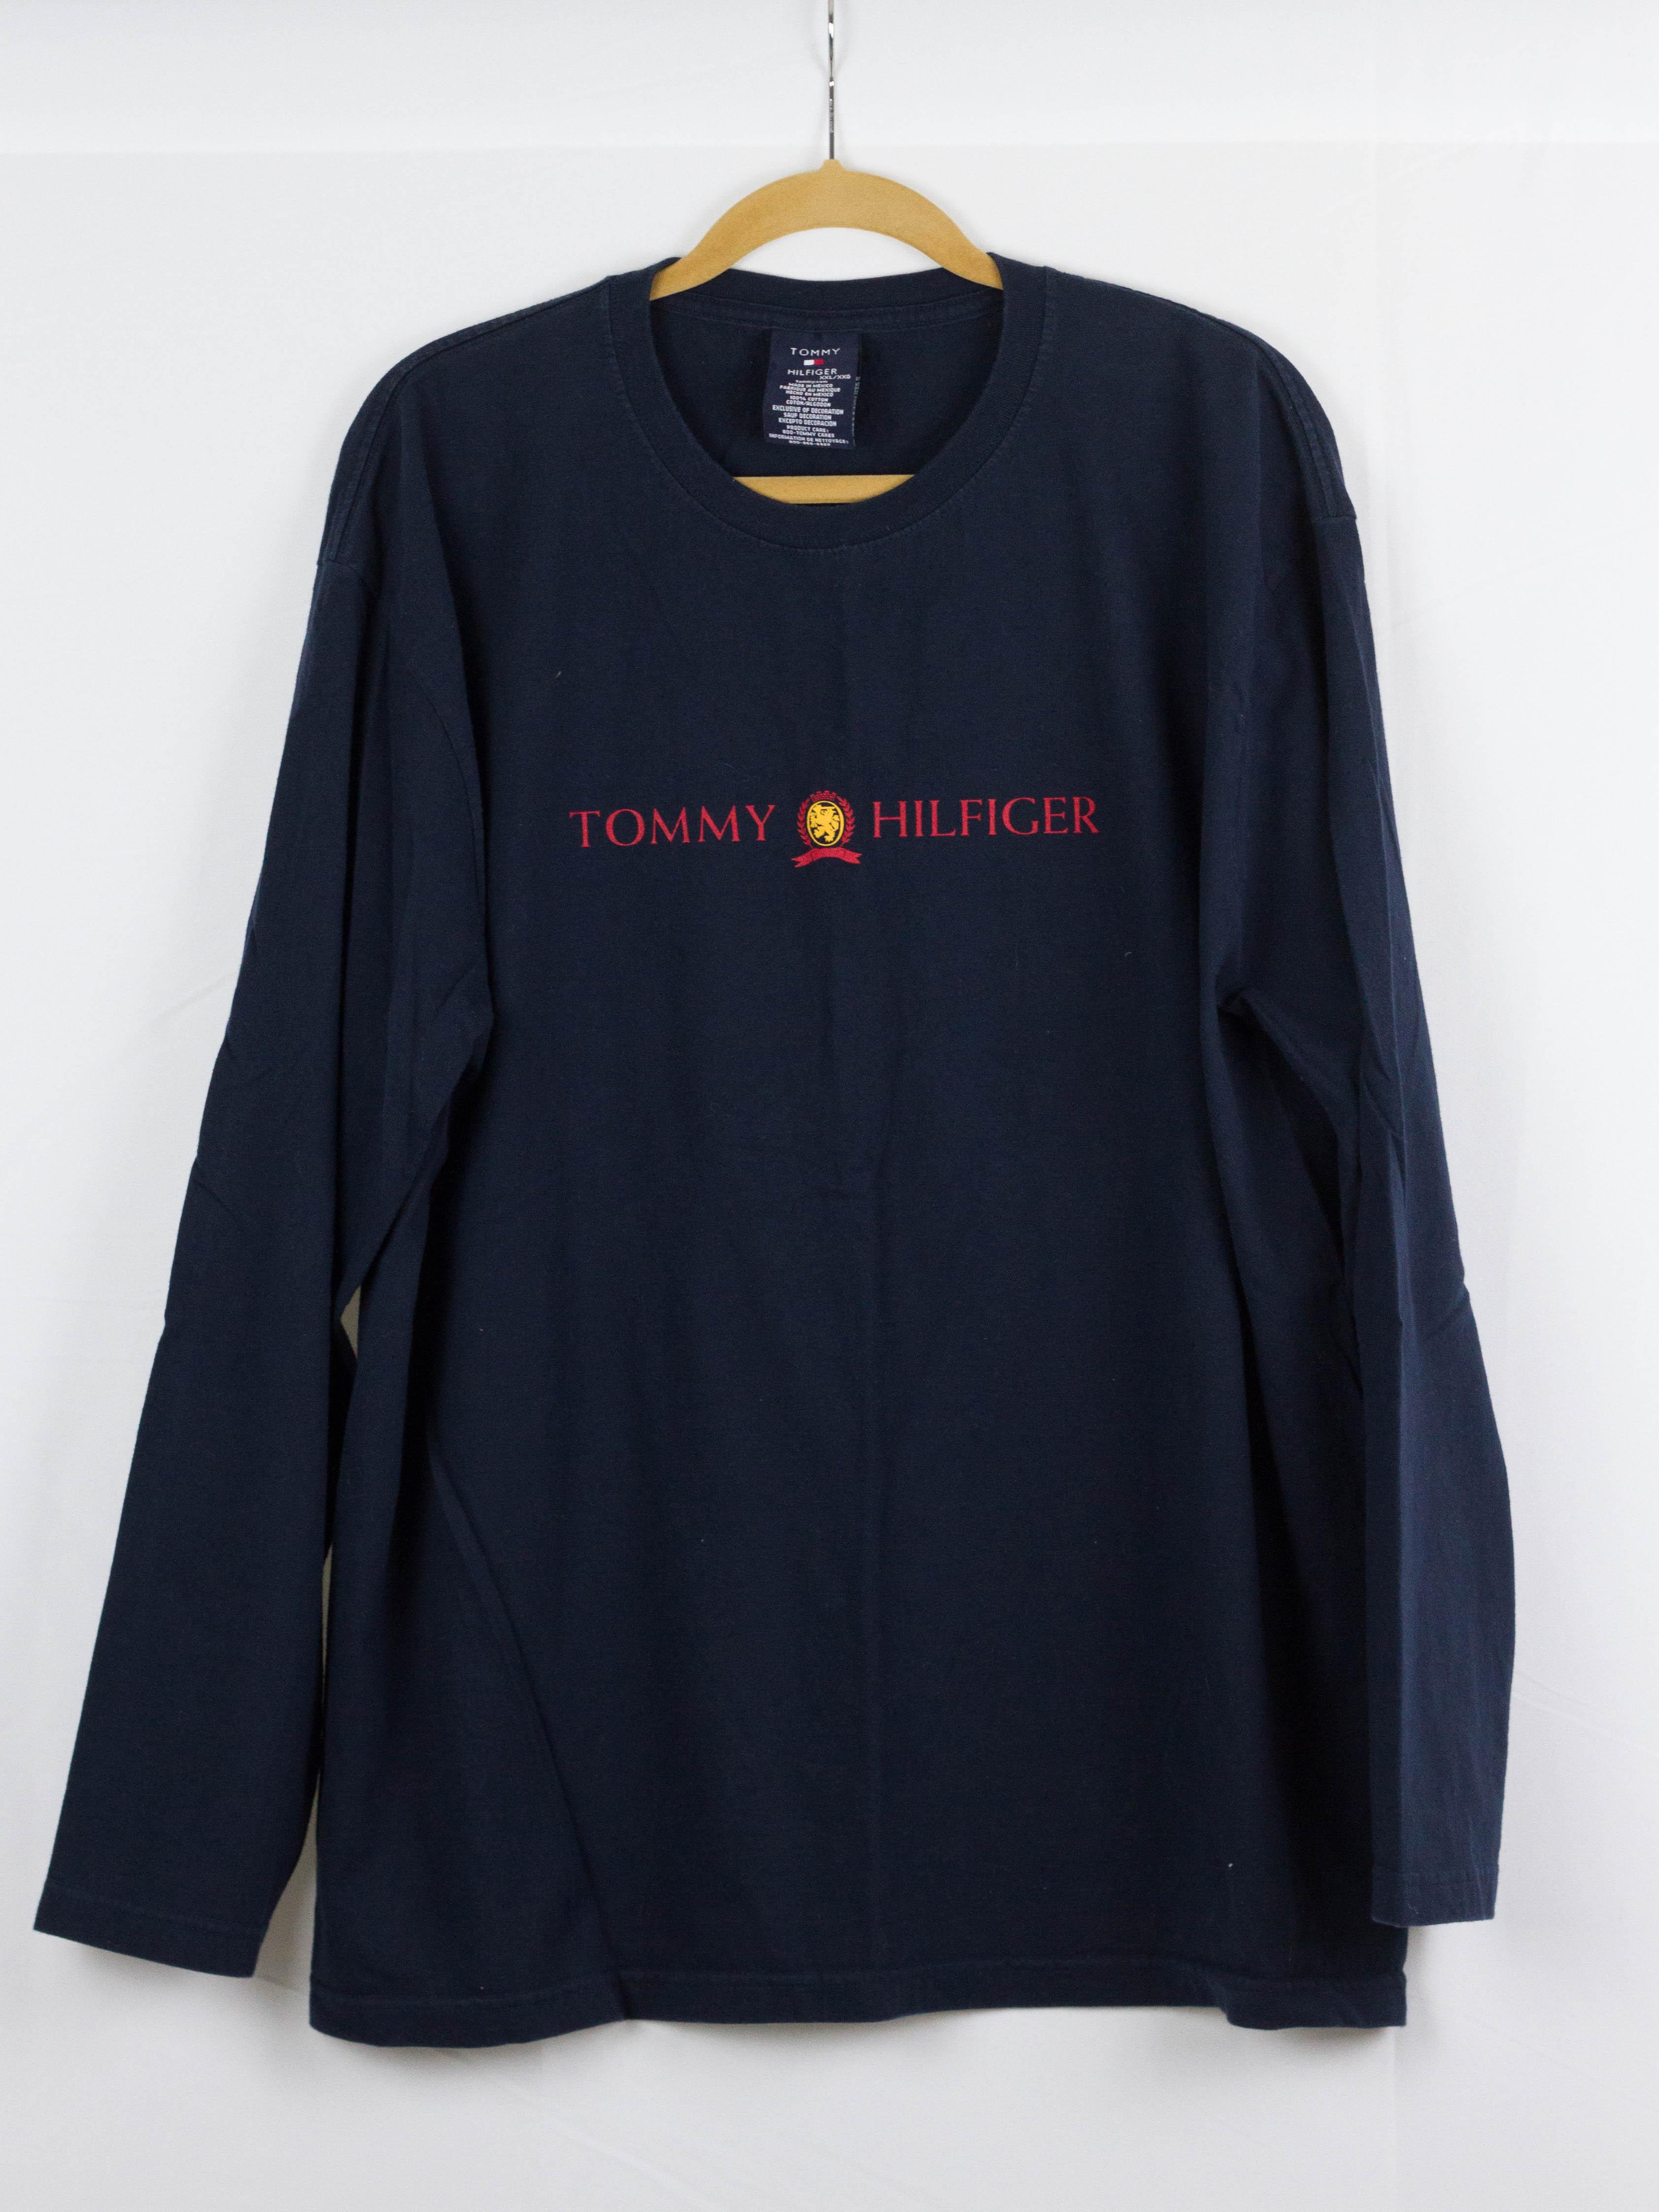 3e1f59a4ee9c Vintage × Tommy Hilfiger ×. VINTAGE HILFIGER CREST GUCCI-ESQUE NOT GUCCI  LONG SLEEVE SHIRT